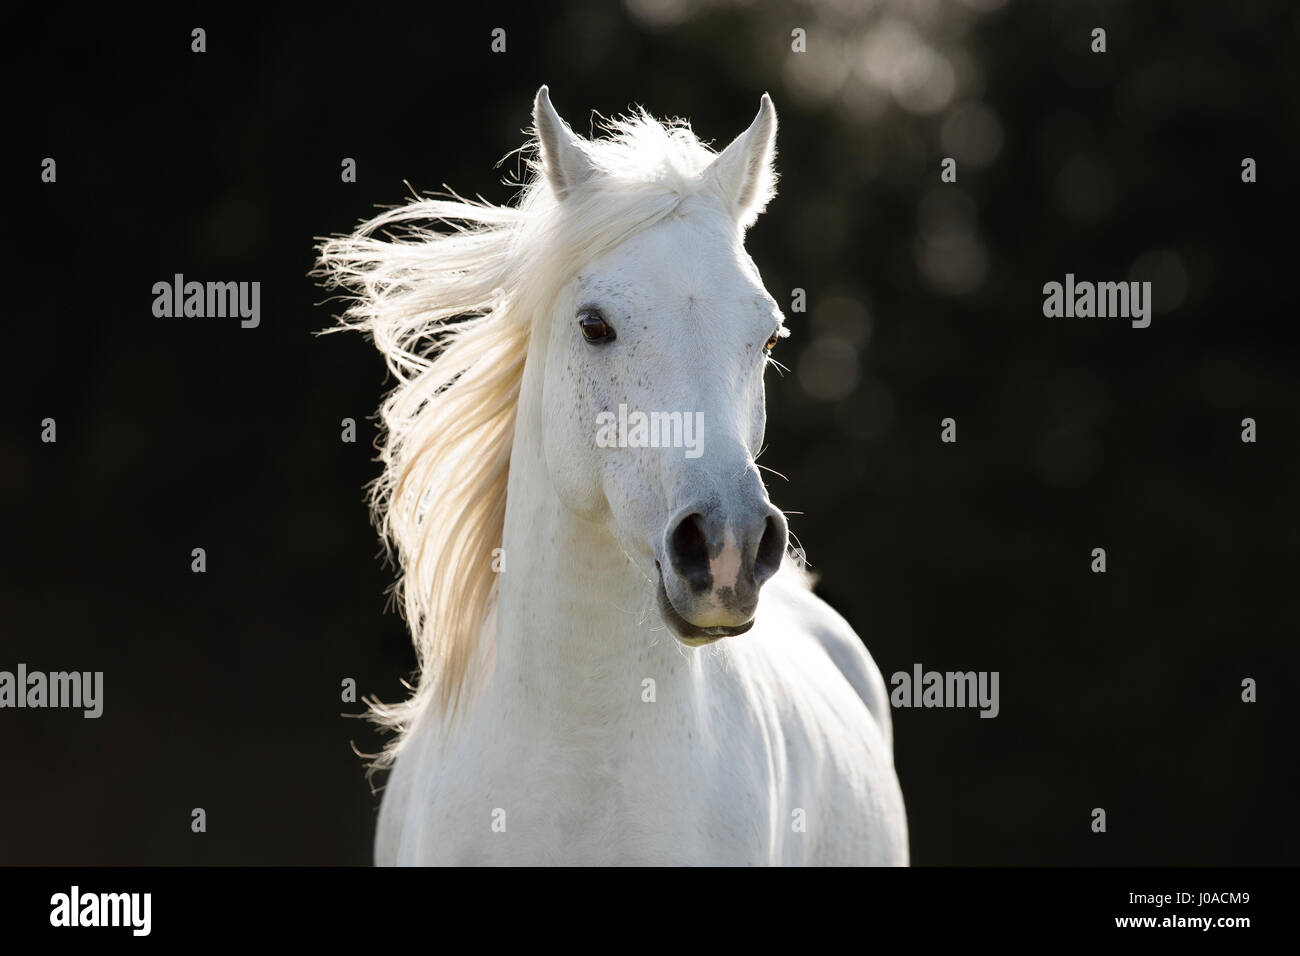 White Arabian stallion galloping, portrait - Stock Image